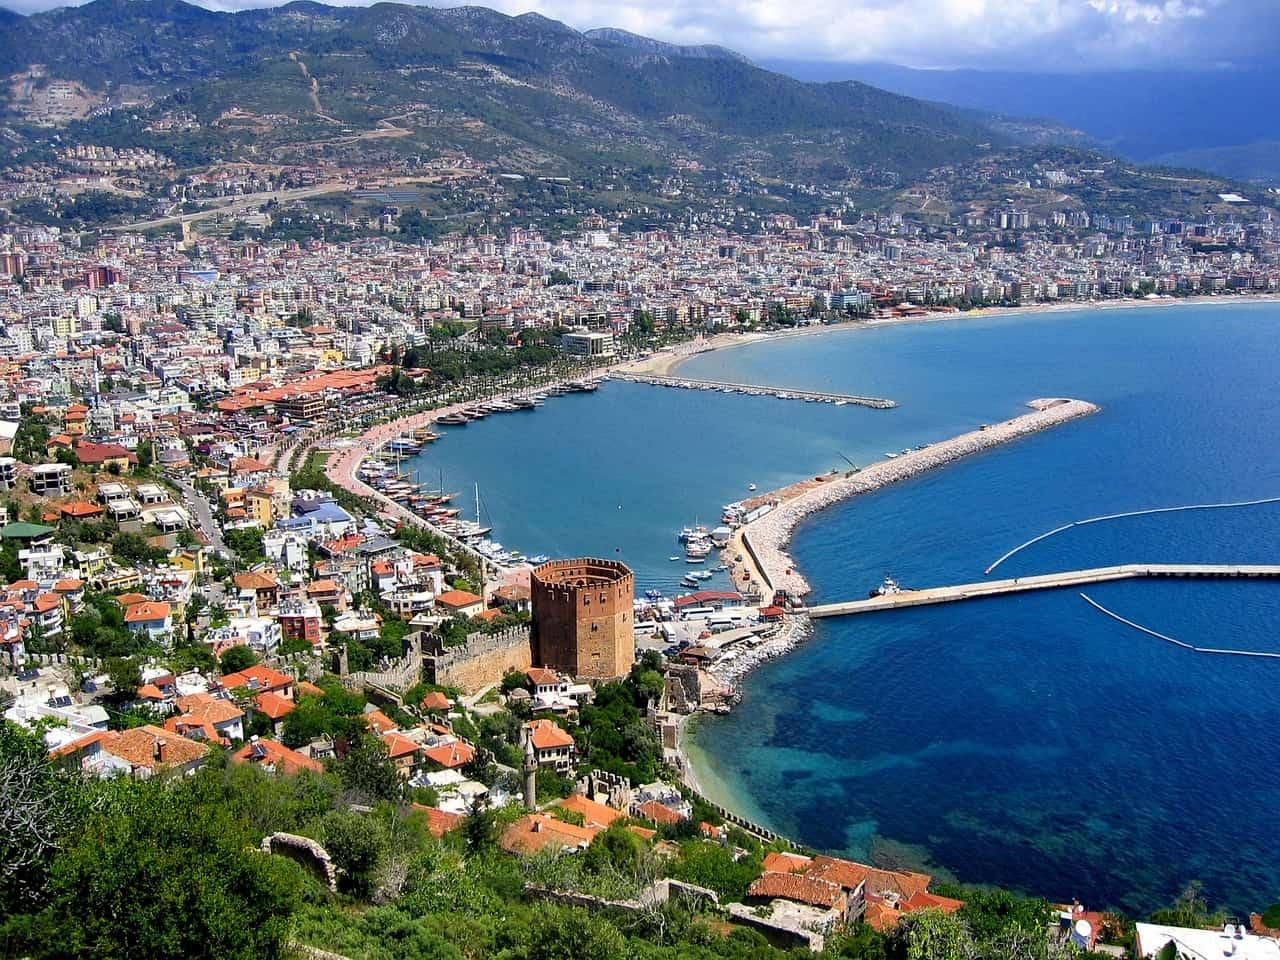 Langzeiturlaub Türkei - nur 273,00€ 23 Tage türkische Ägäis